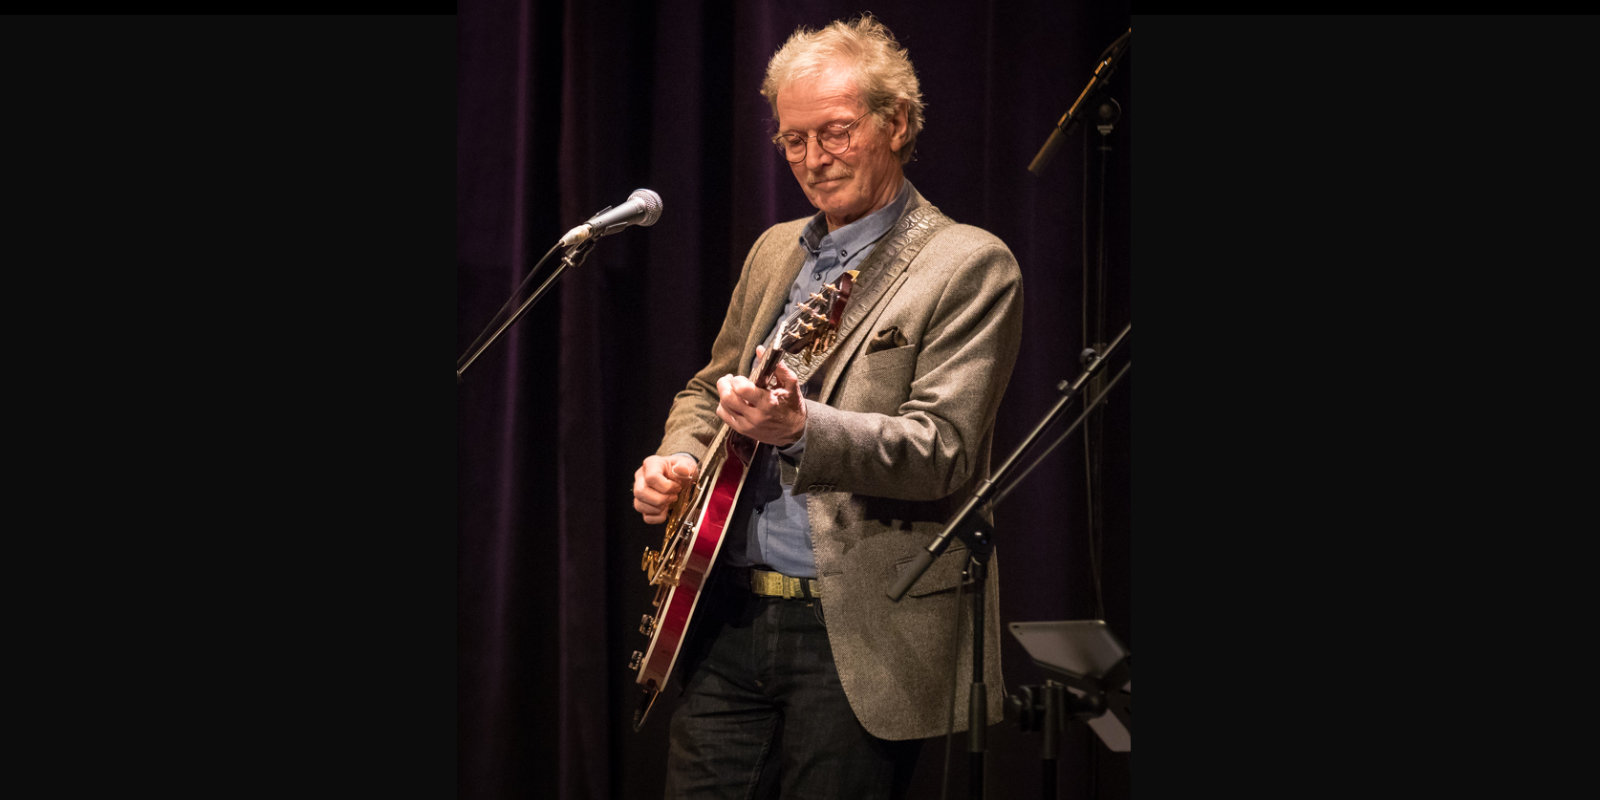 Øystein Sunde - gitarist i verdensklasse